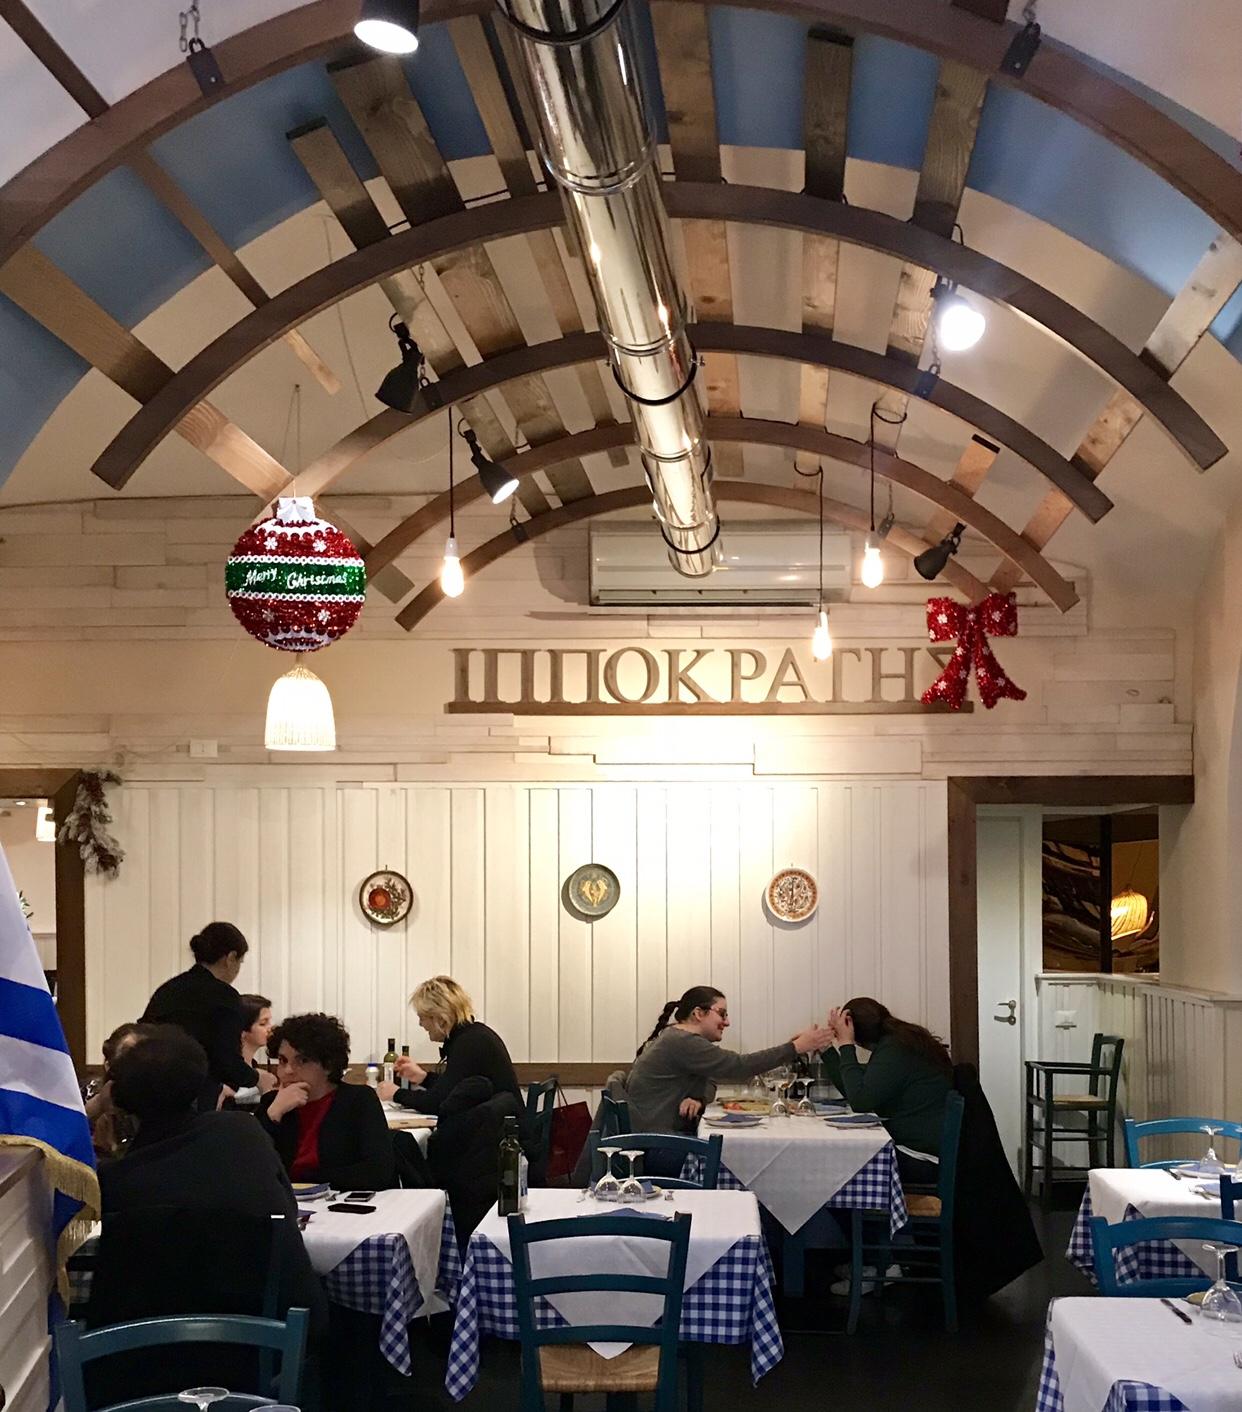 ippokrates ristorante roma